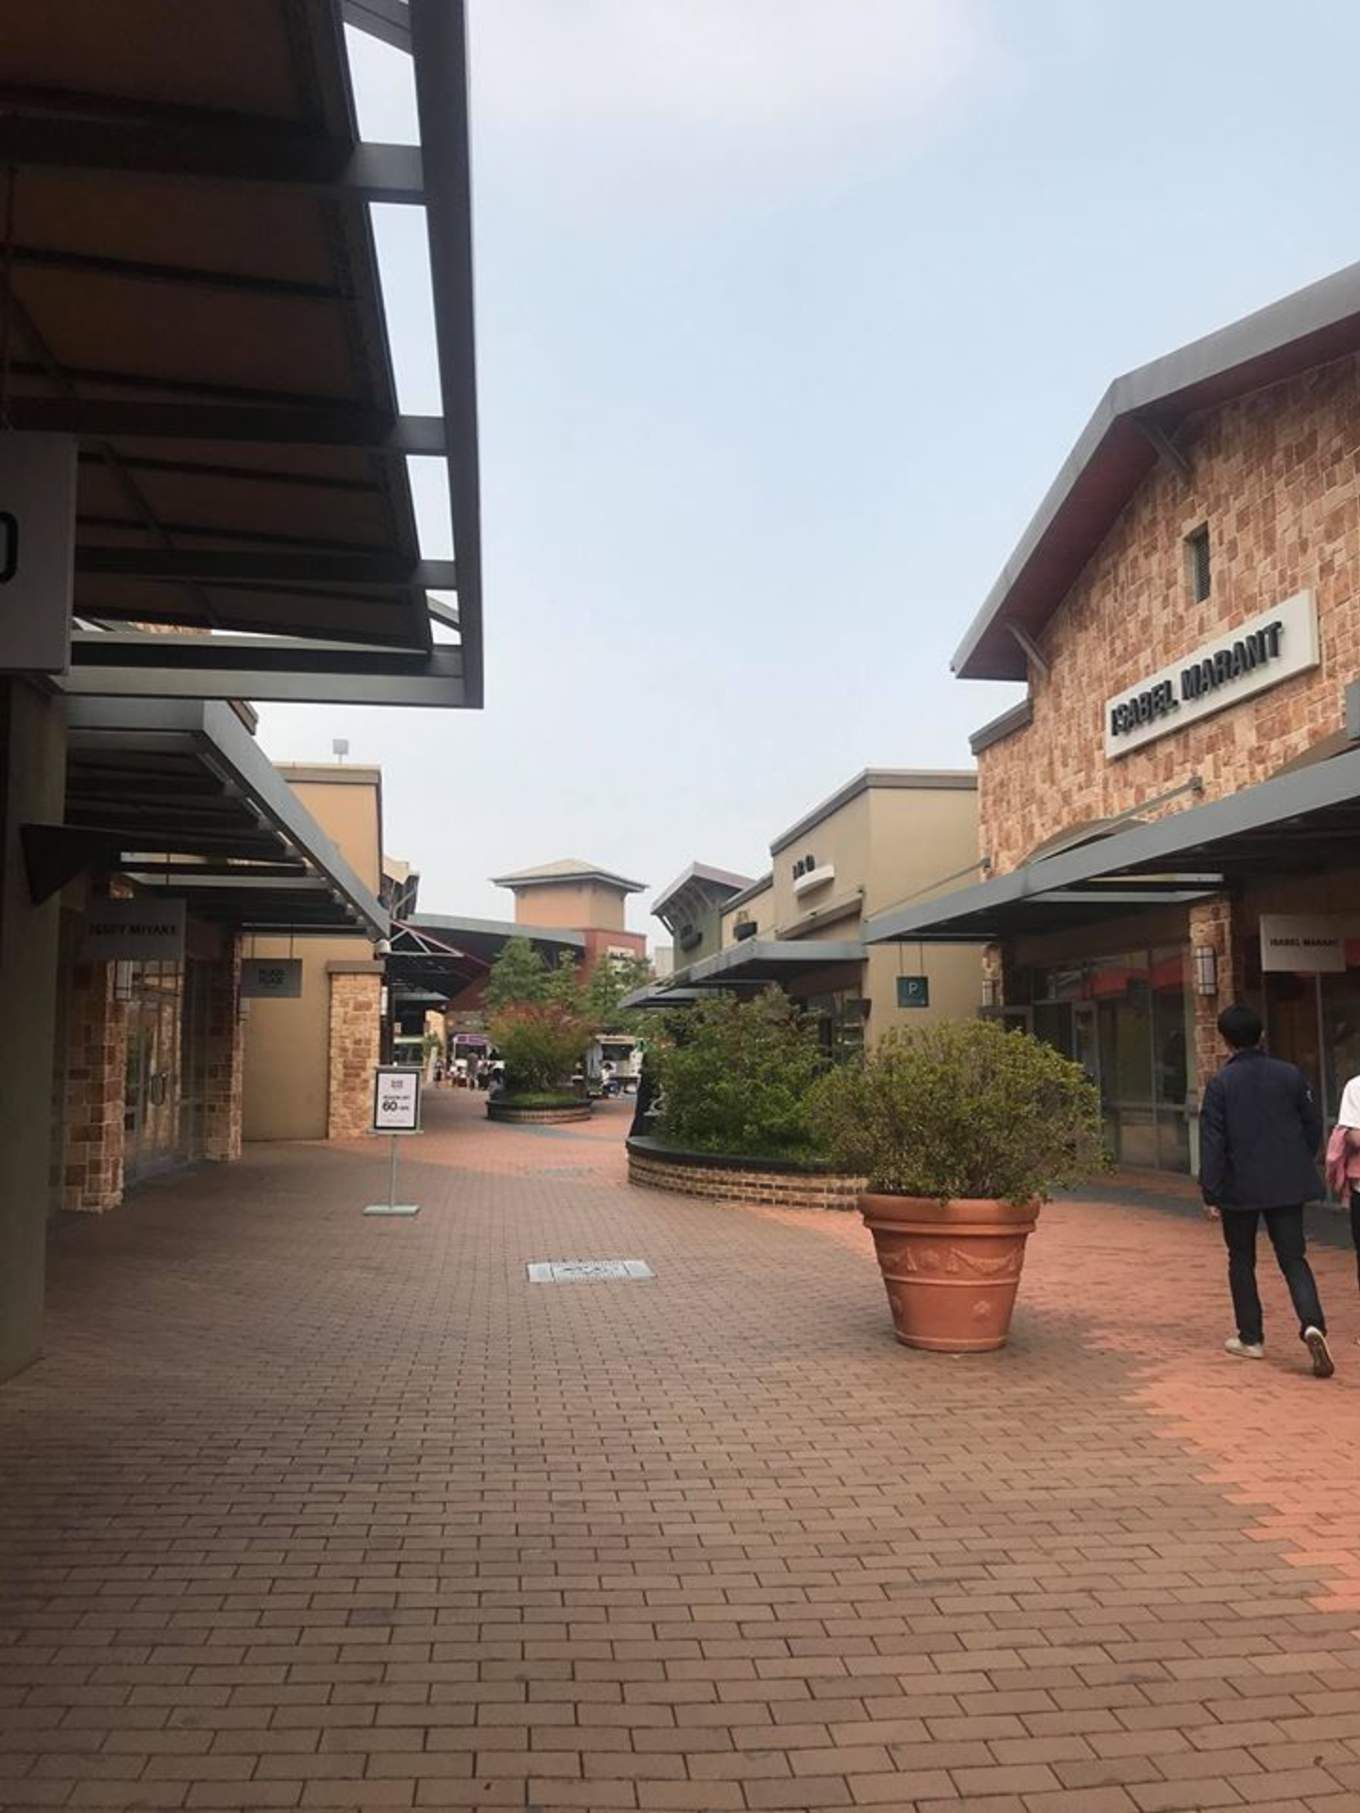 gyeonggi-do outlet là nơi mua sắm ở seoul